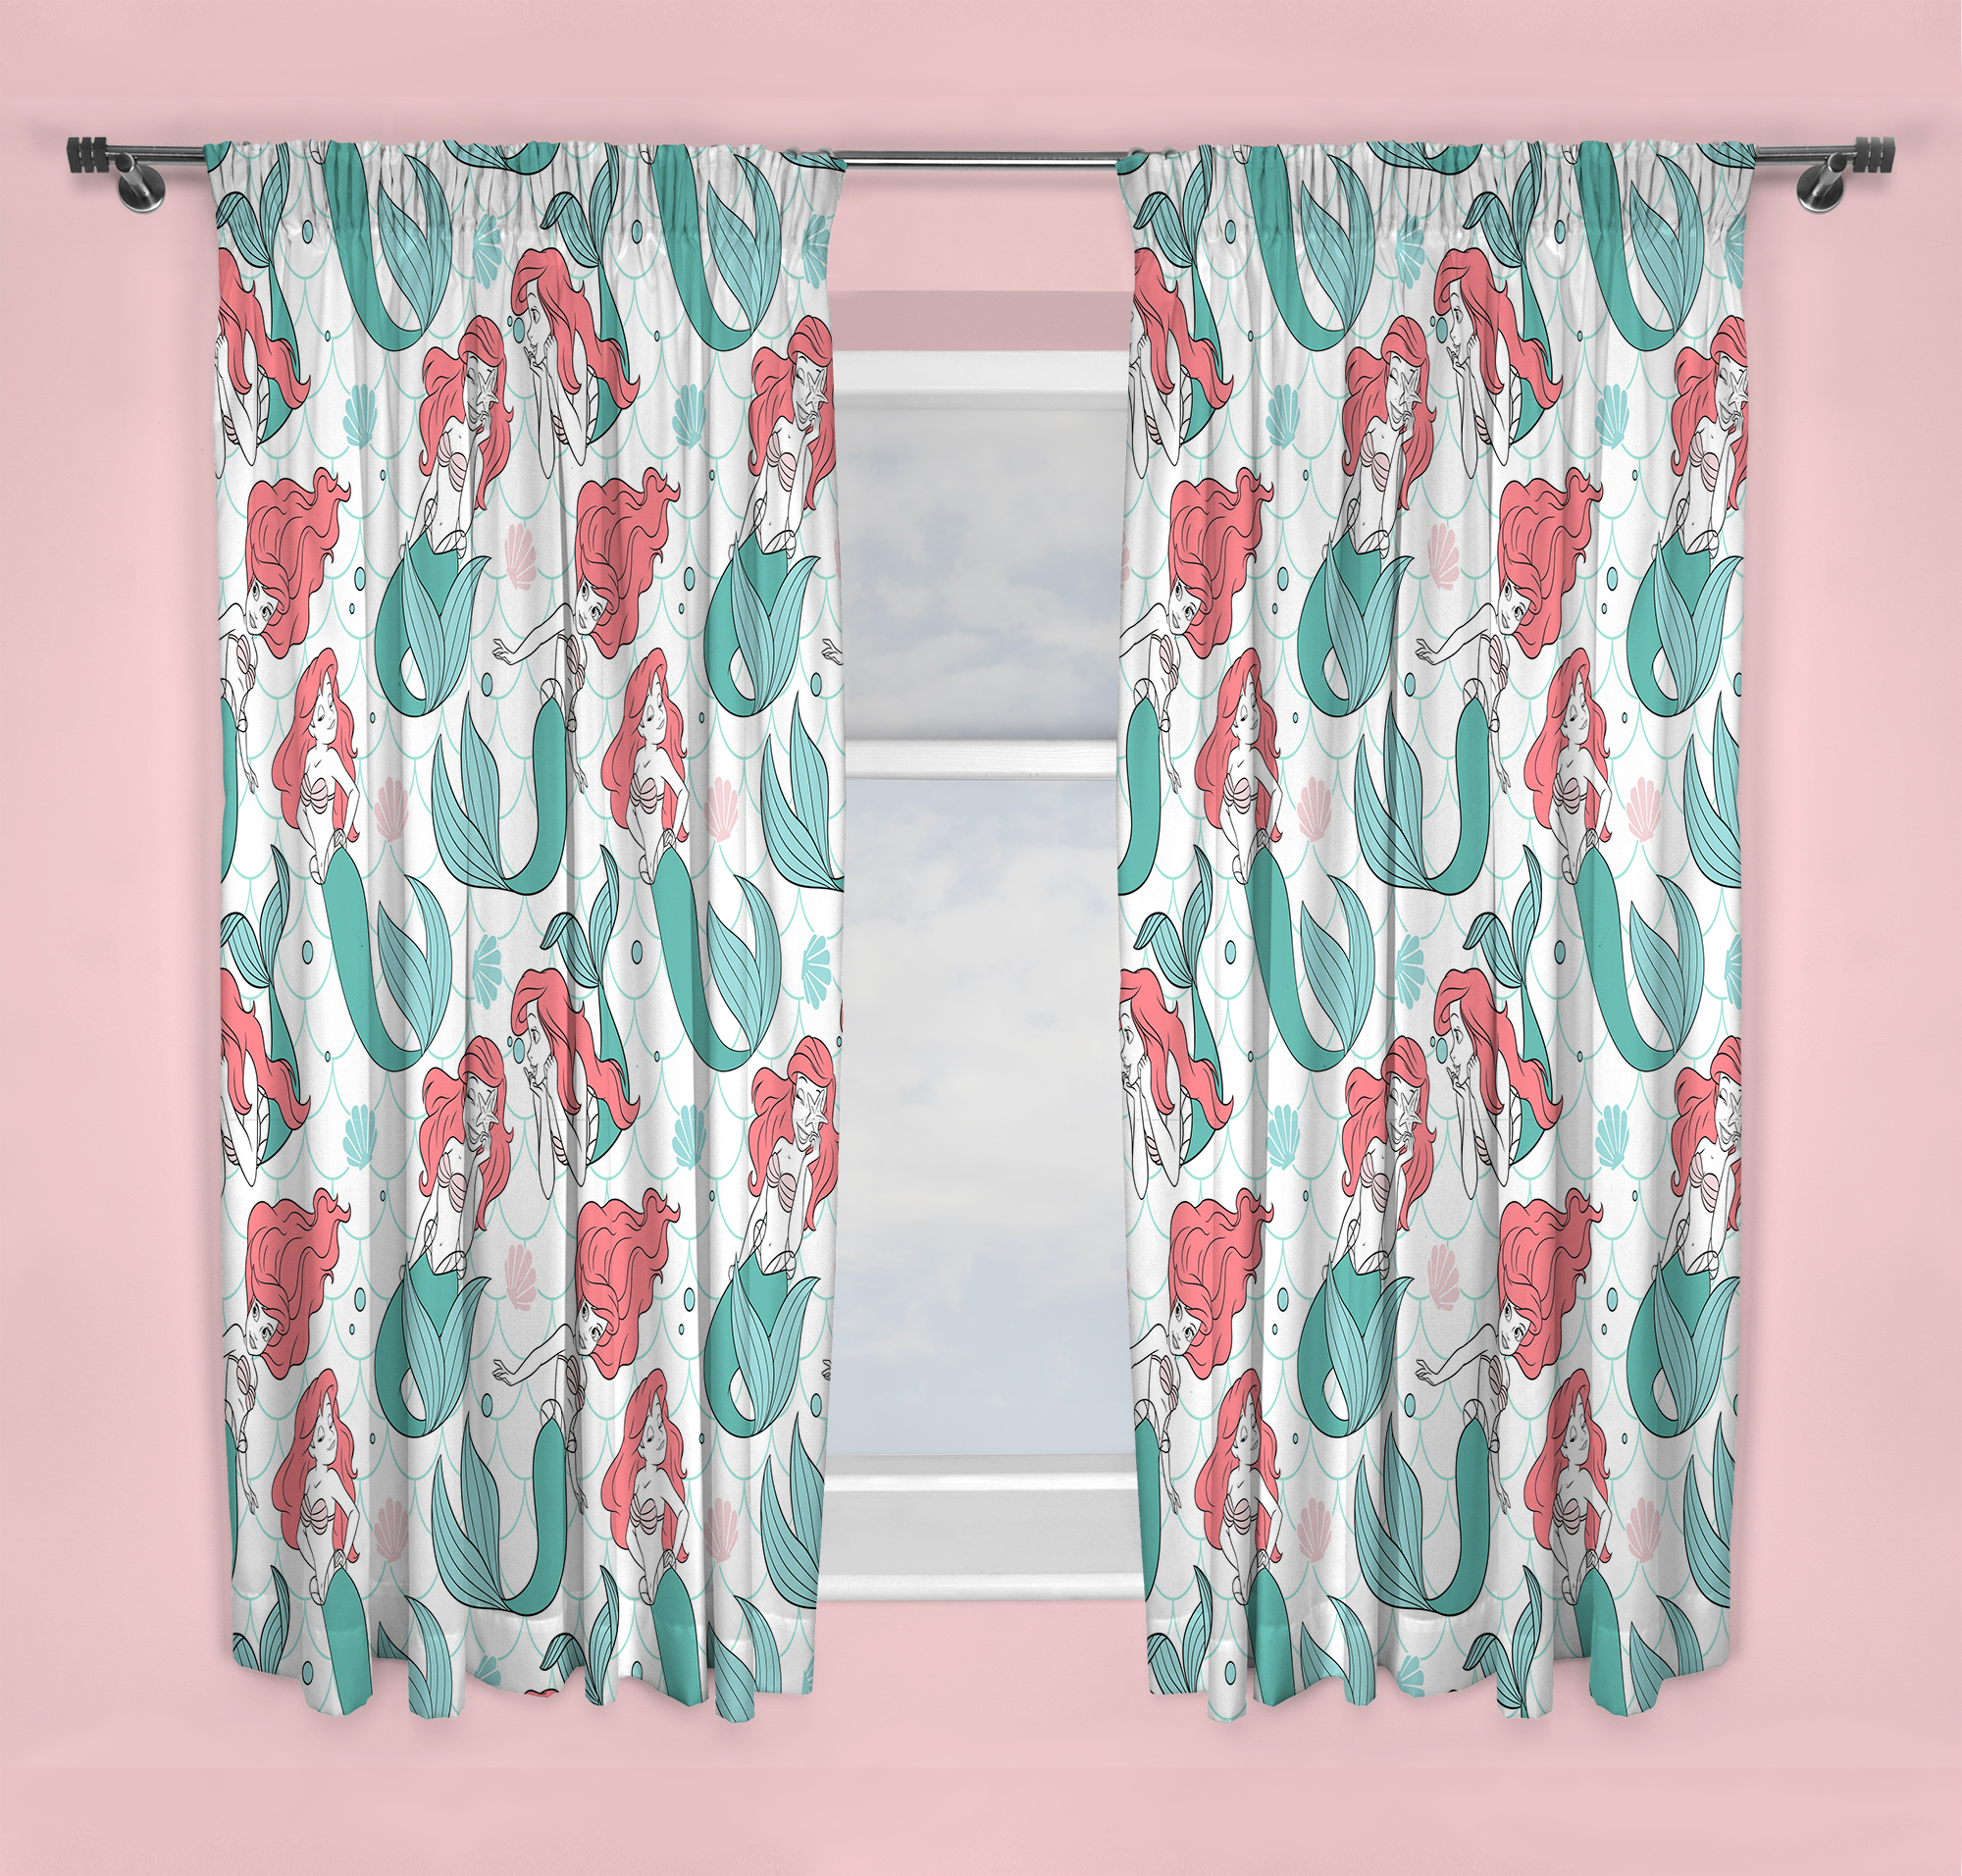 Disney Princess Oceanic Design Curtains  66X54 Inch